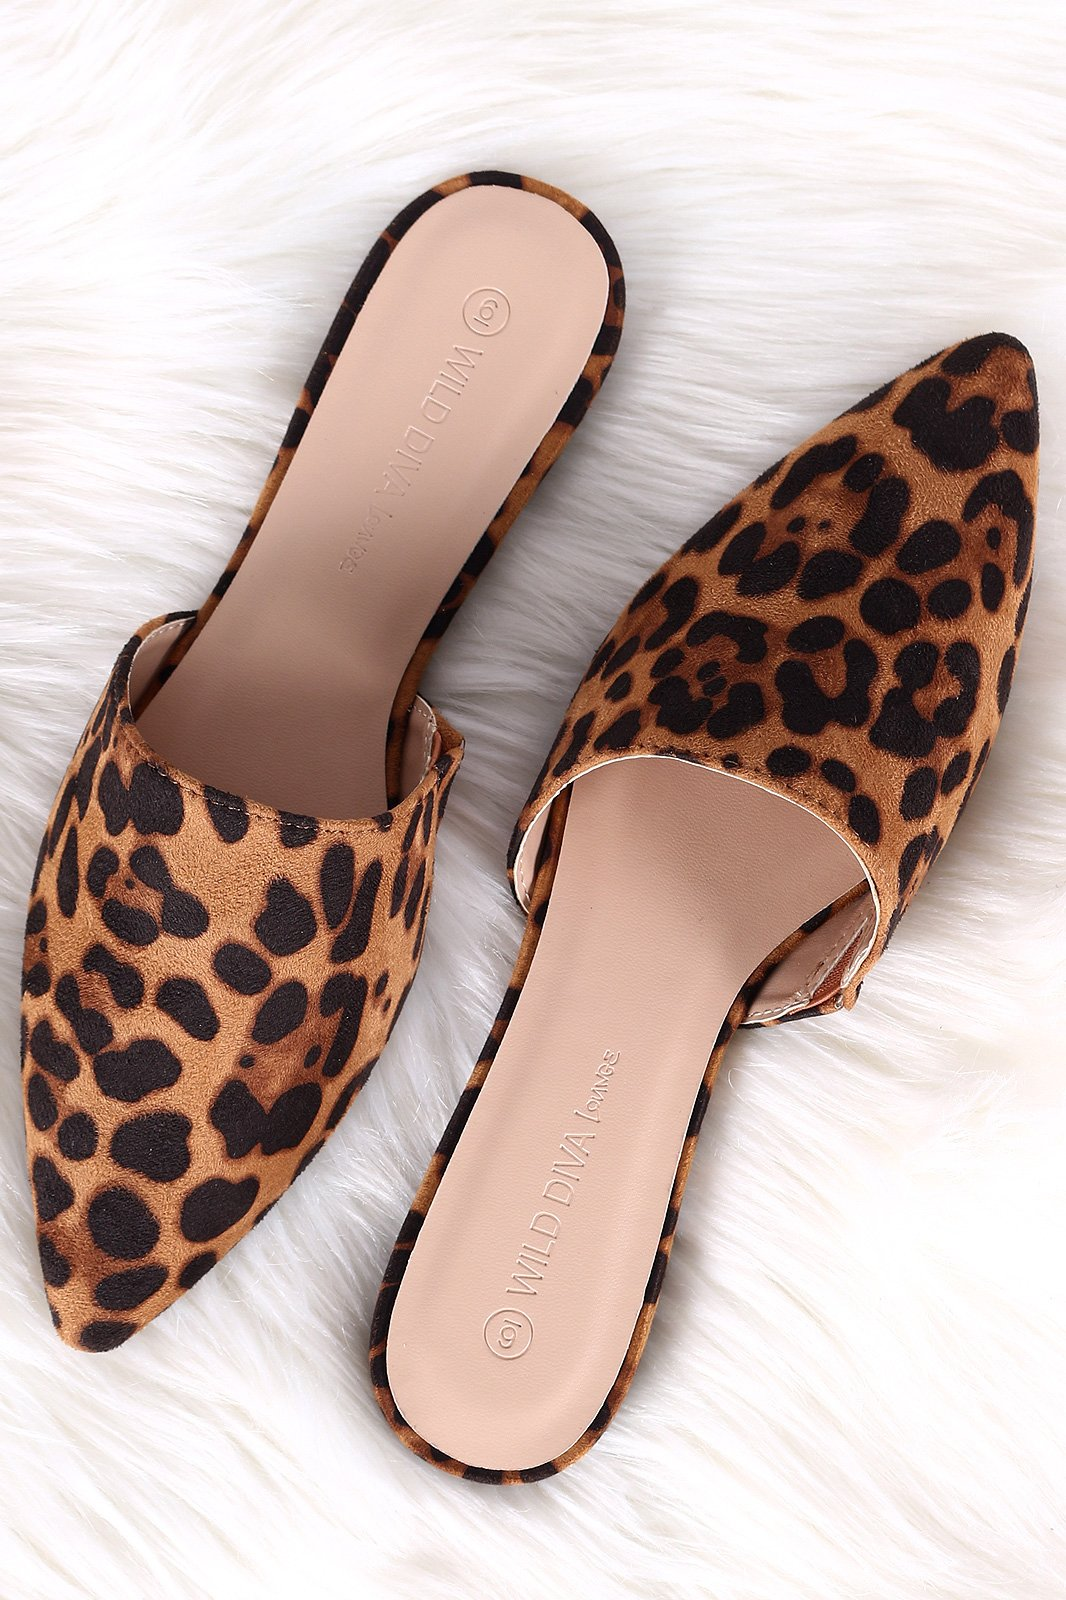 Wild Diva Lounge Leopard Suede Pointy Toe Mule Flat  6344e9a880b